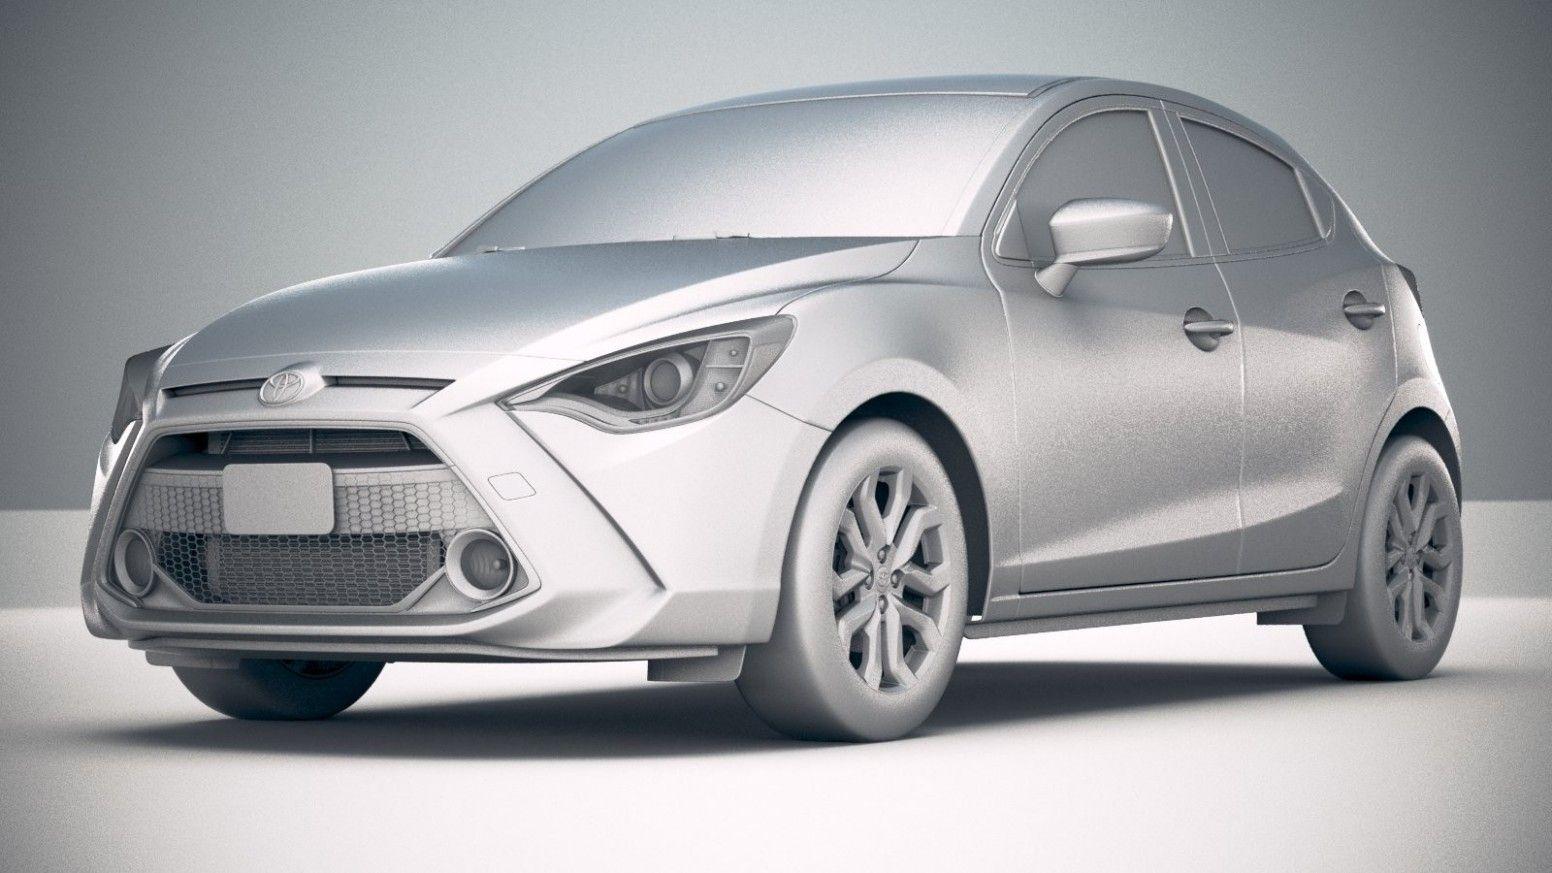 Toyota Hatchback 2020 Concept (Dengan gambar)